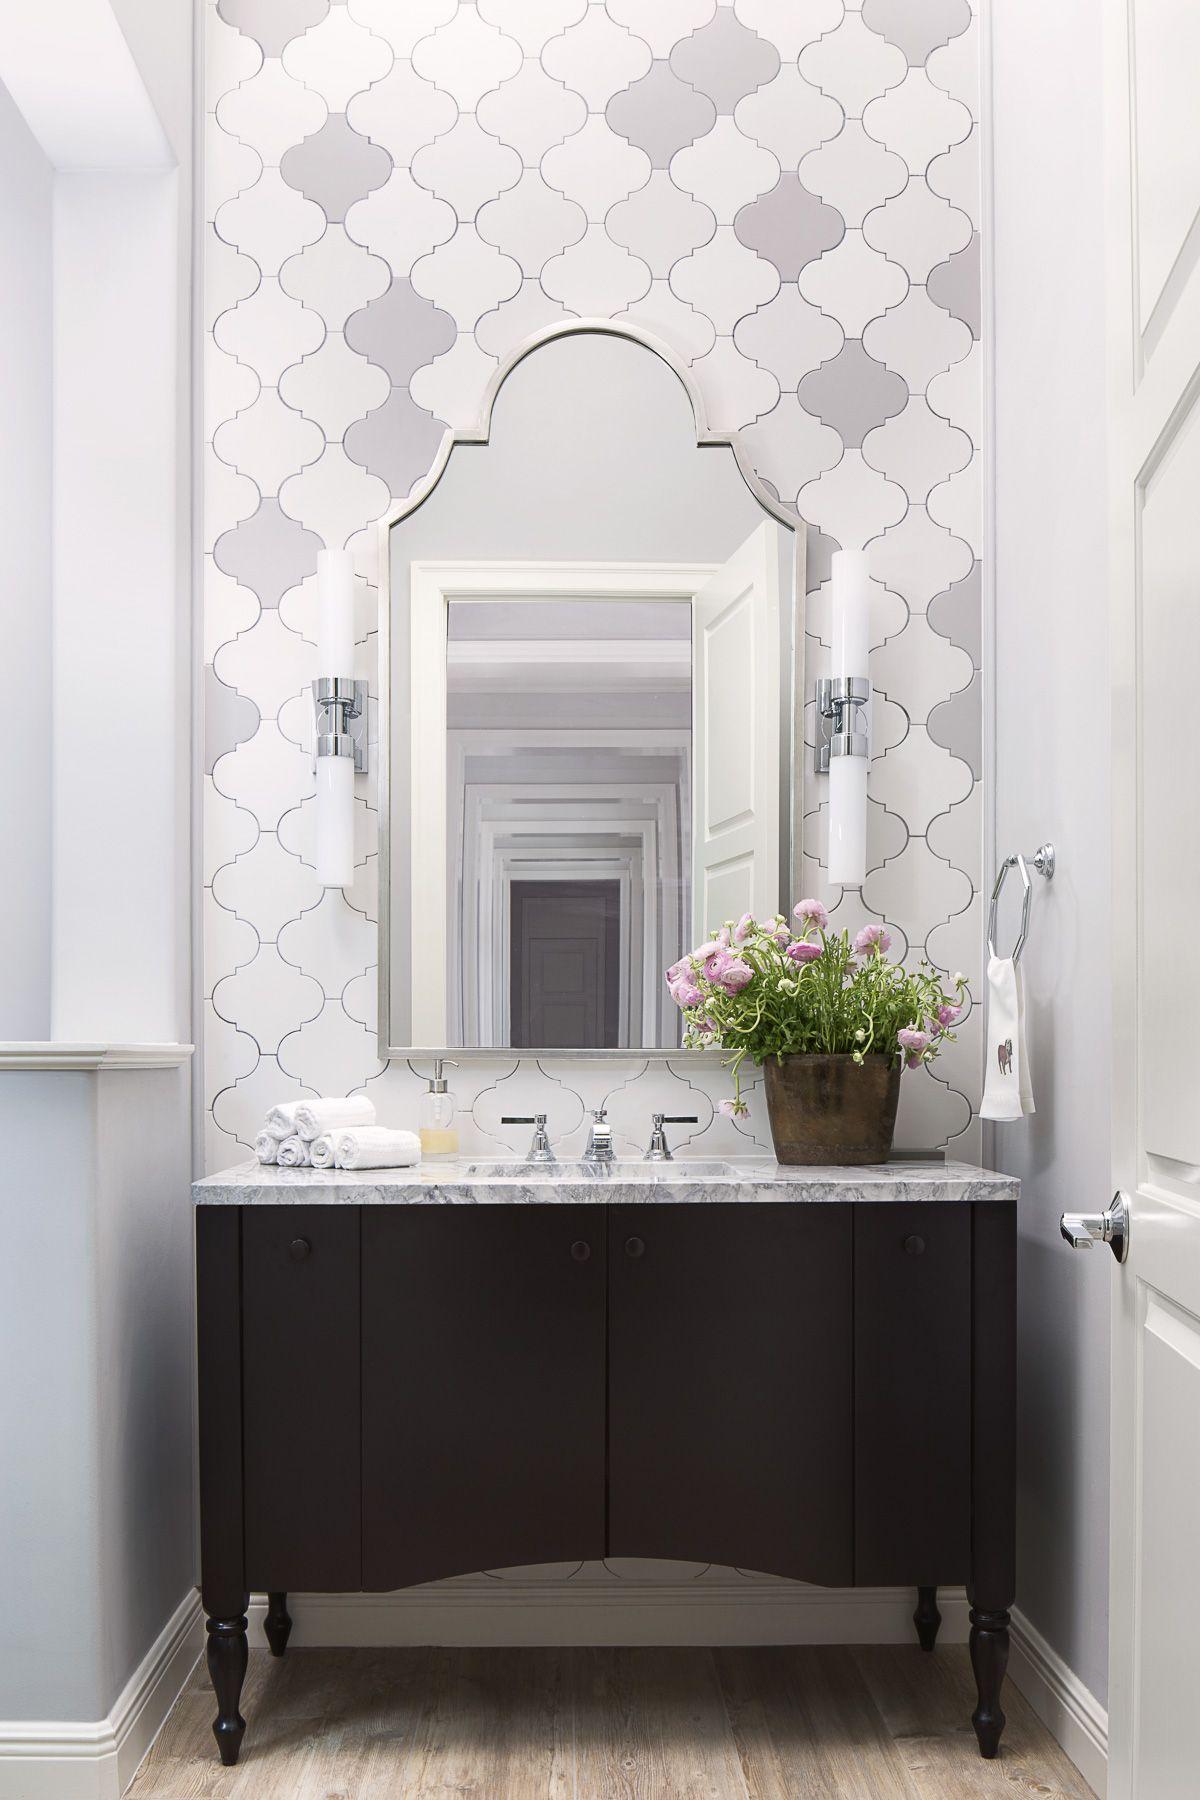 Aero Club Wellington Bathroom Design Trends Top Bathroom Design Bathroom Interior Design